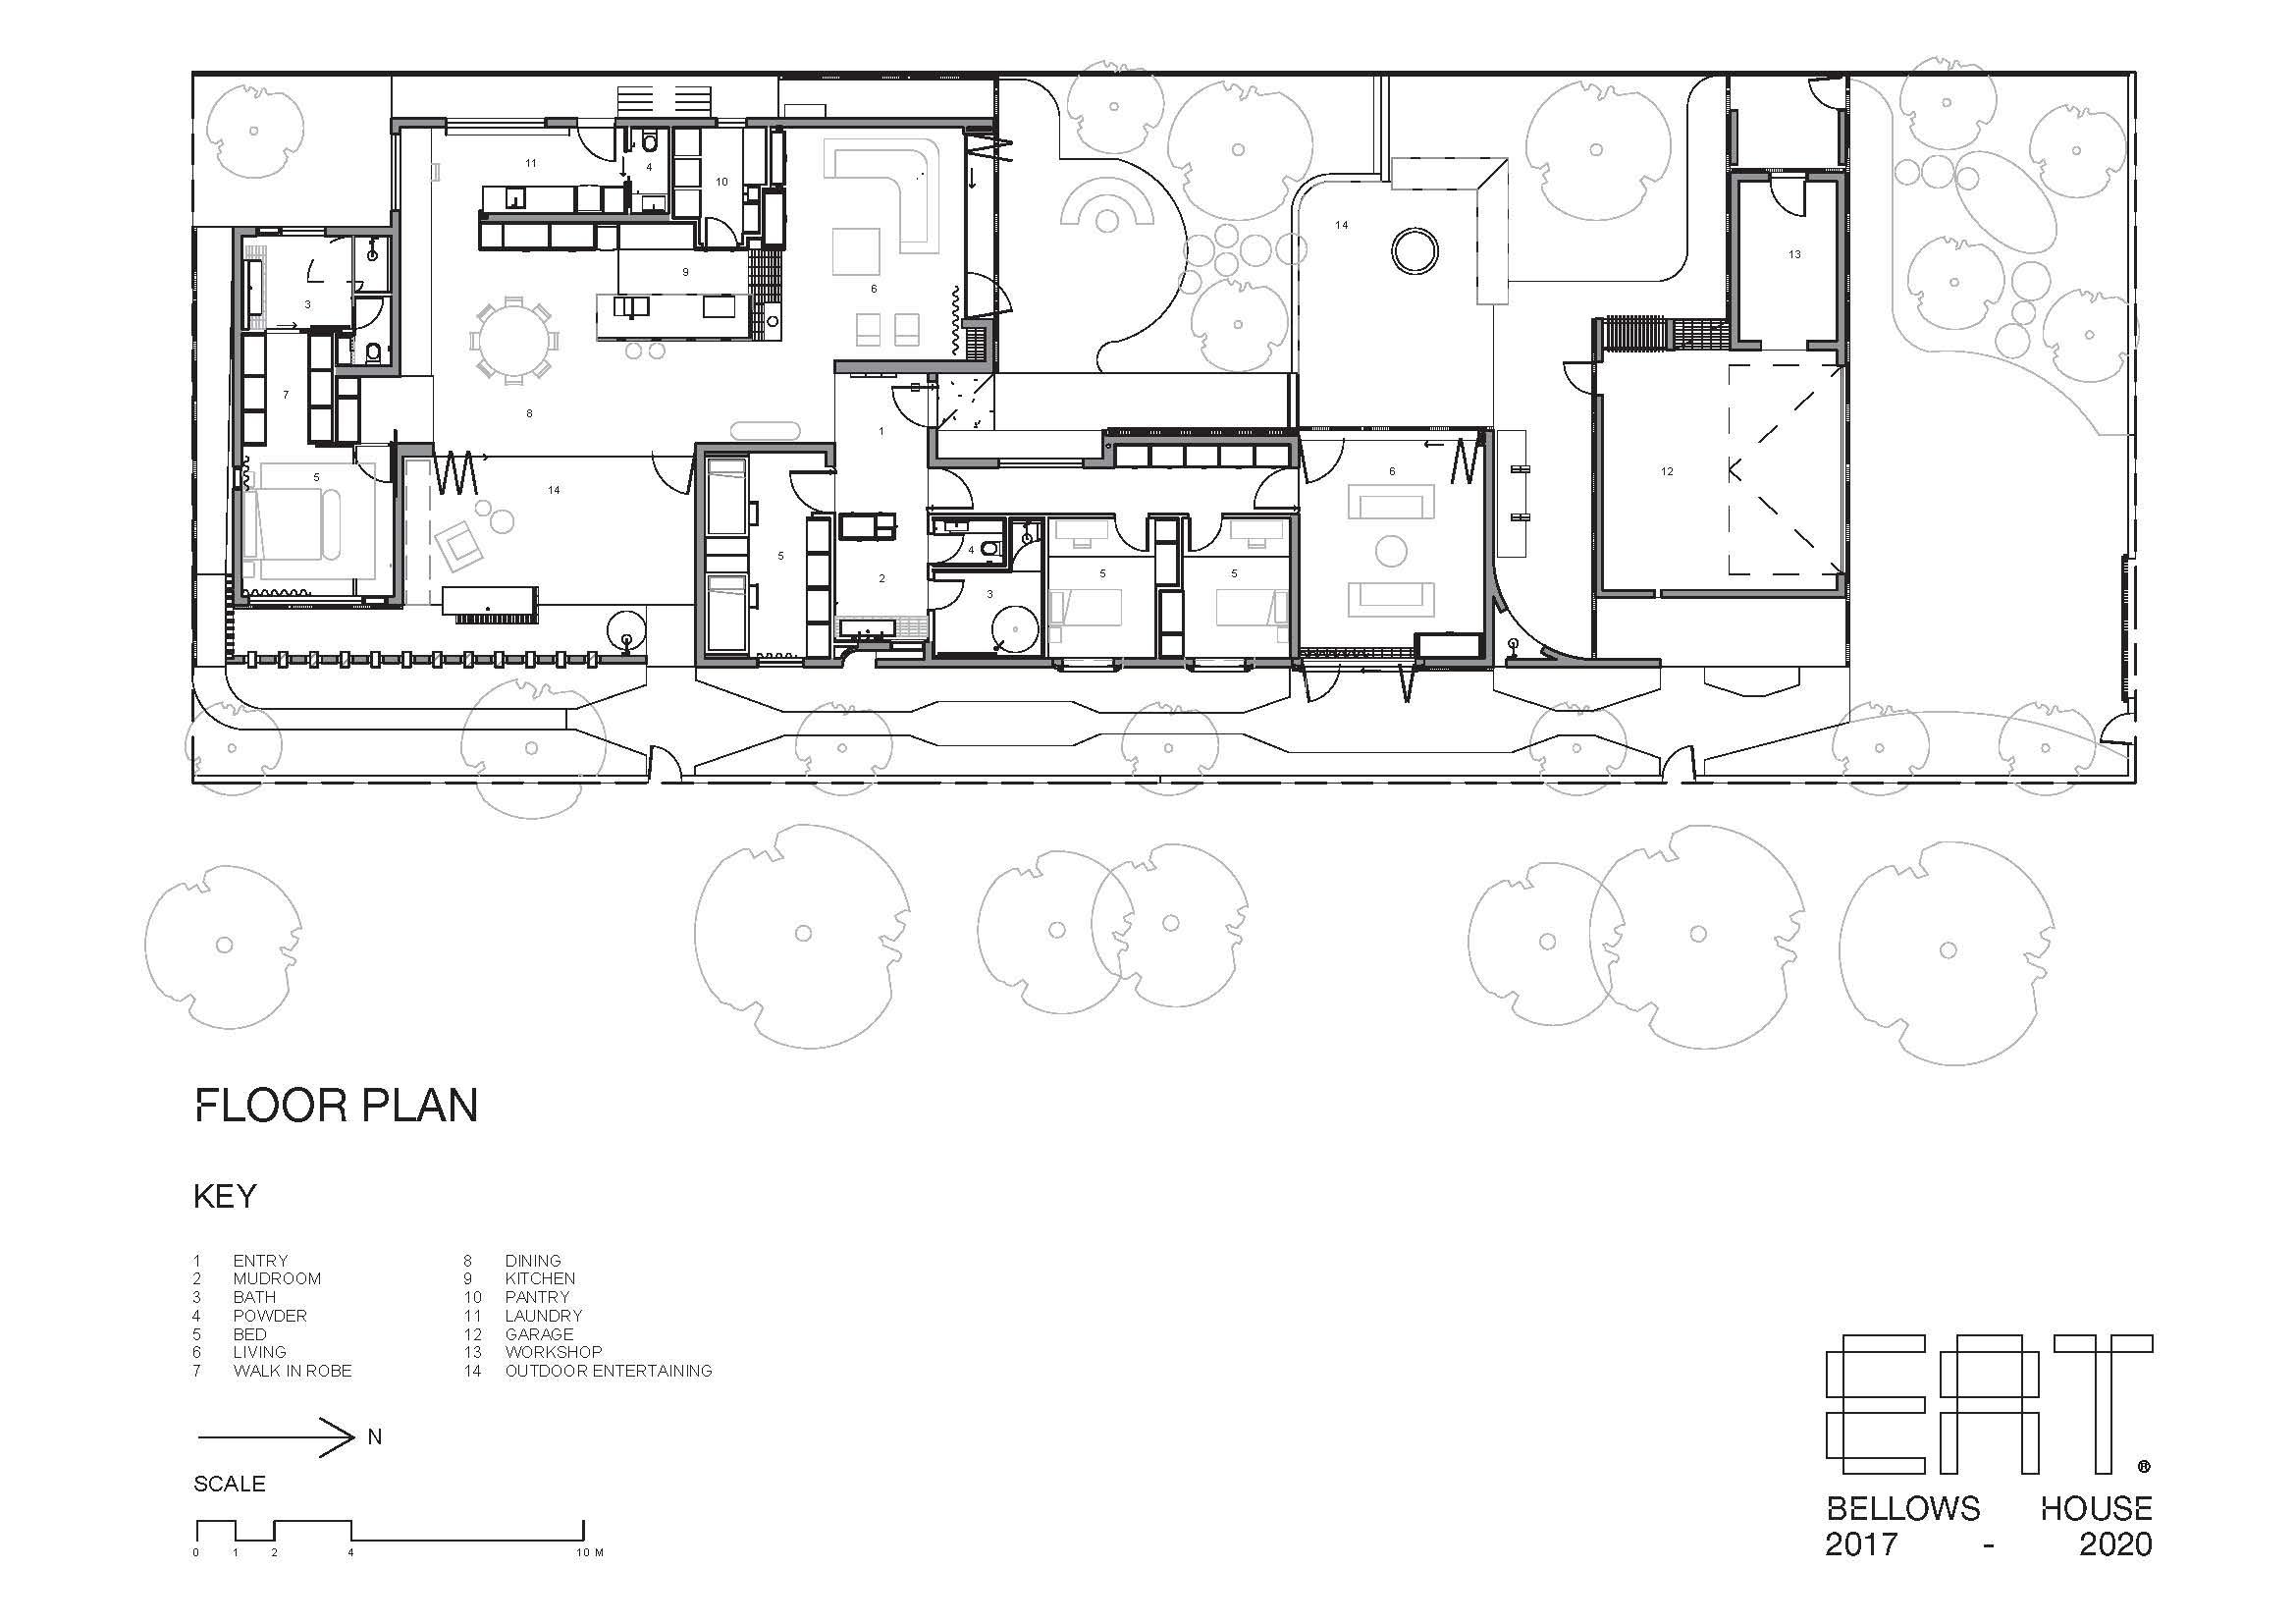 Architects Eat Bellows Beach House Flinders Masonry Architecture Floor Plan Yellowtrace